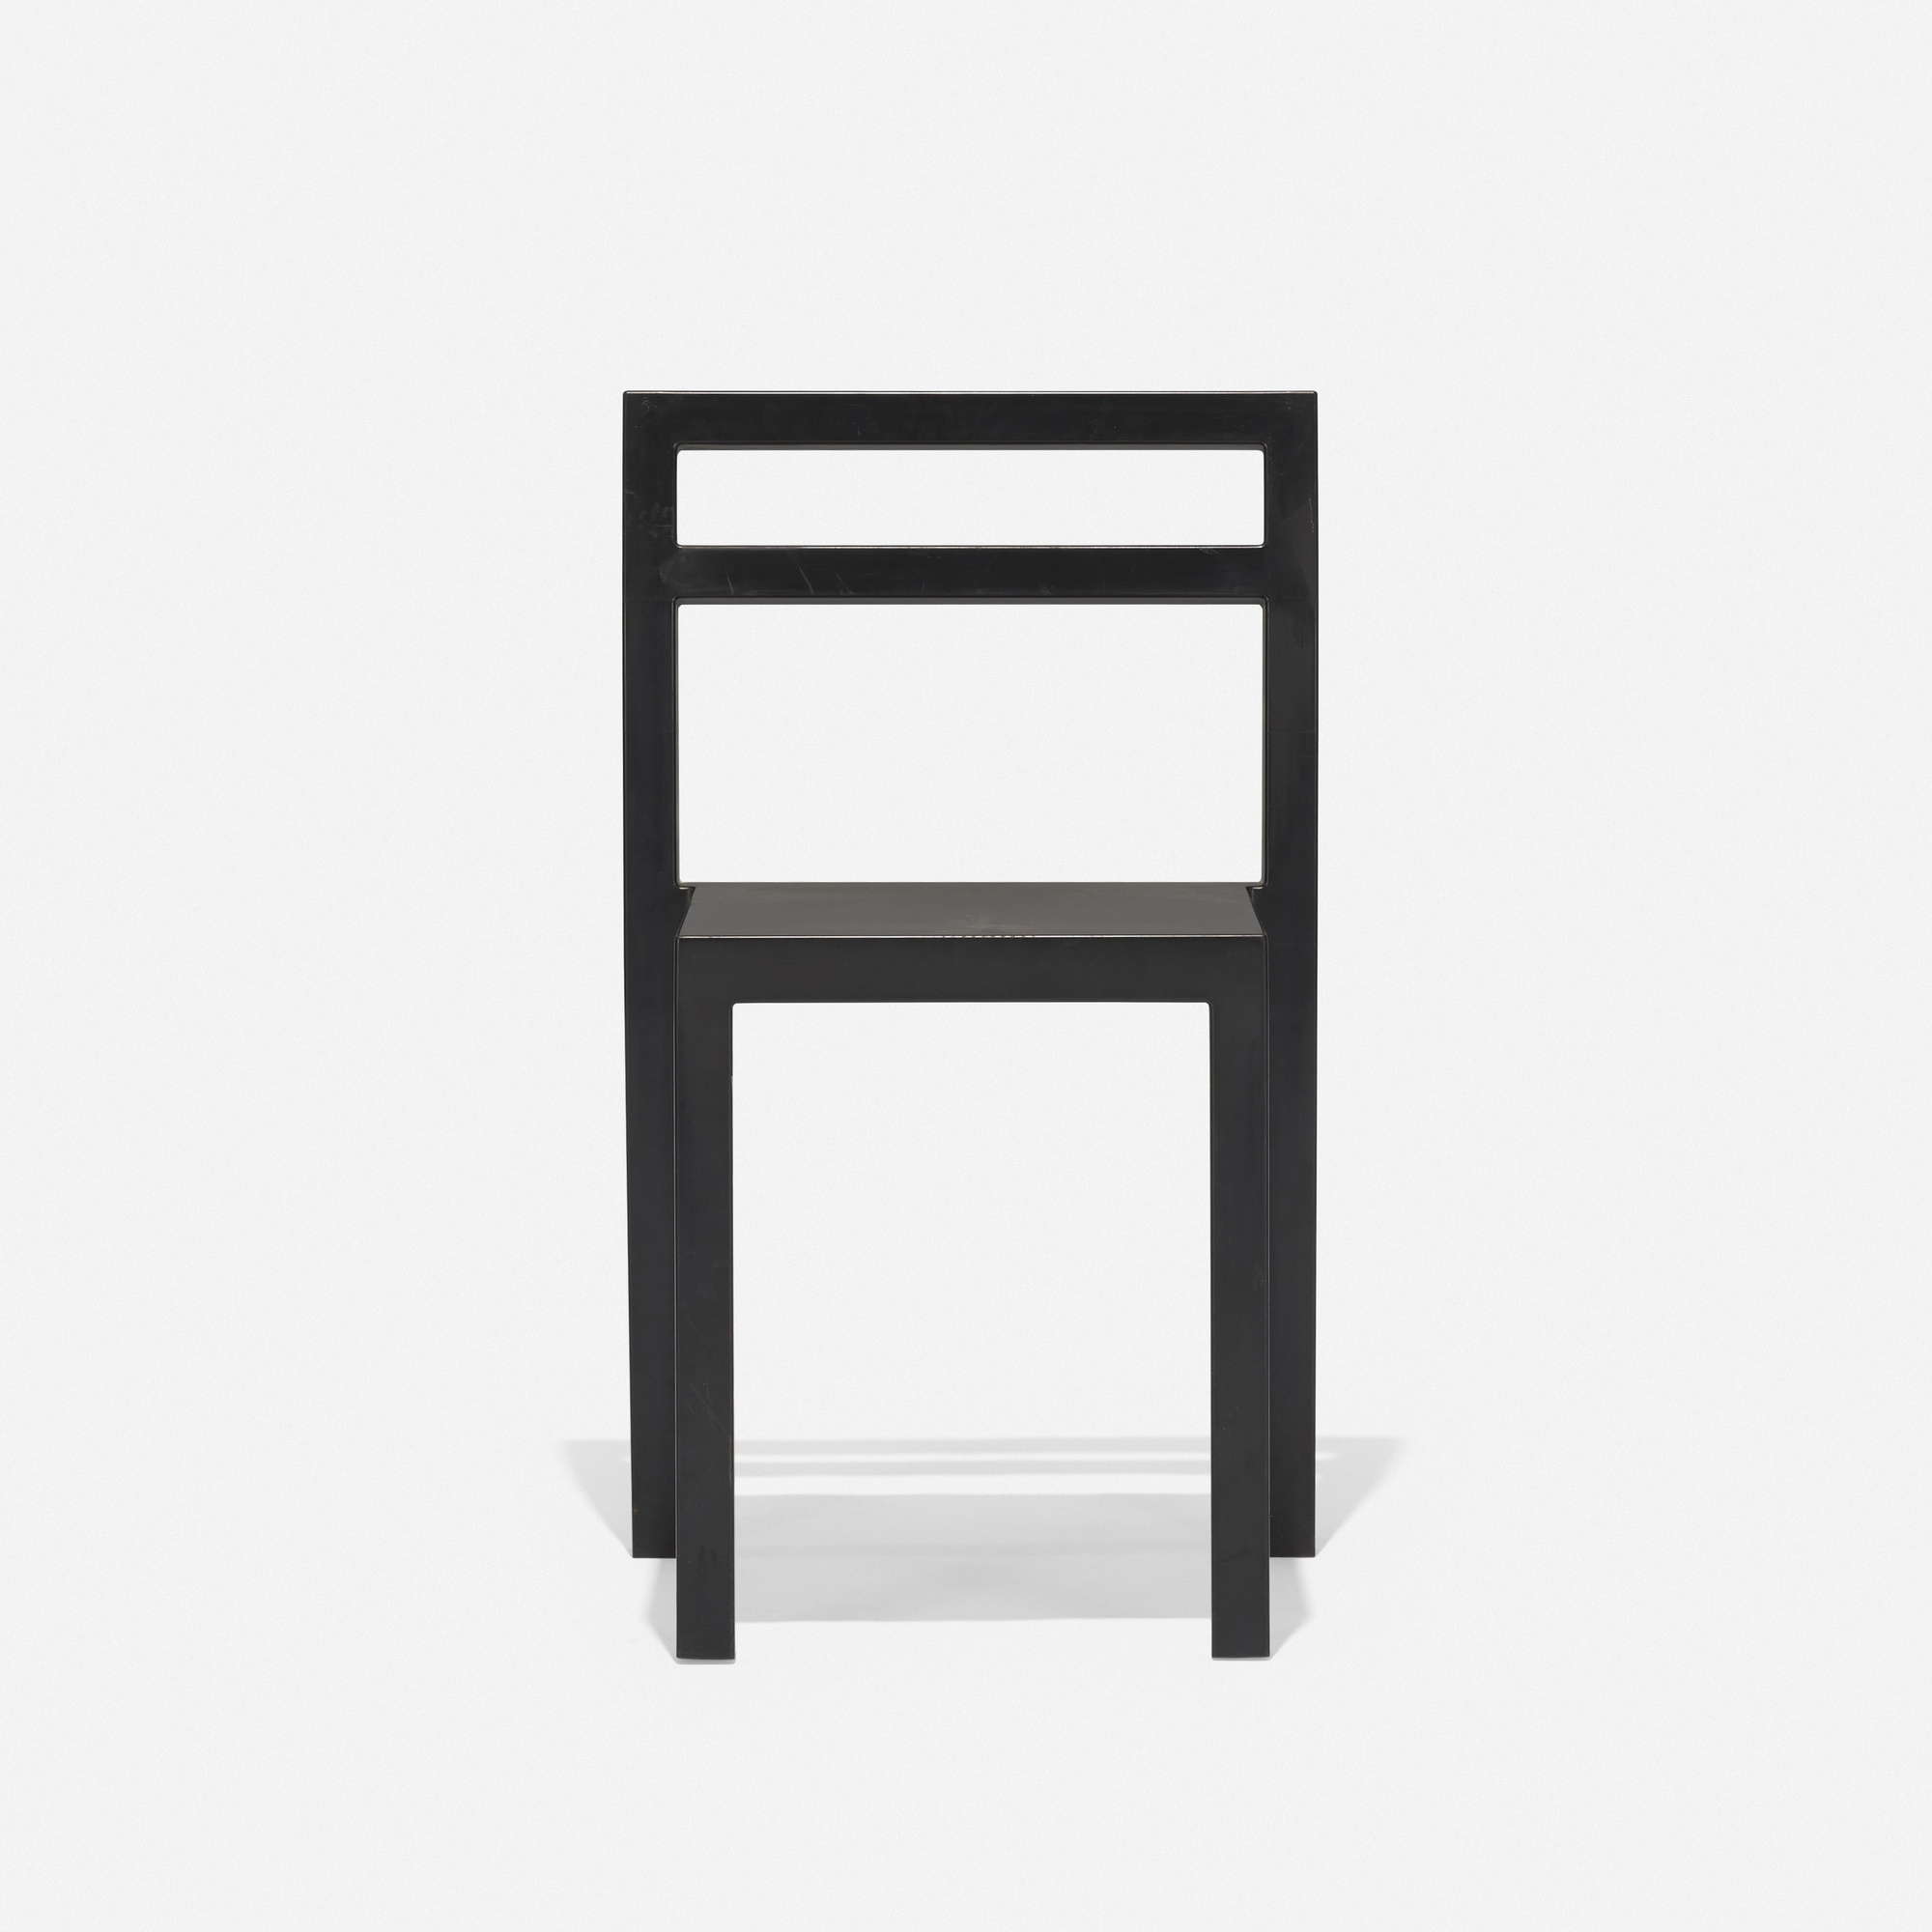 424: Komplot Design (Poul Christiansen and Boris Berlin) / Non Chair (2 of 3)